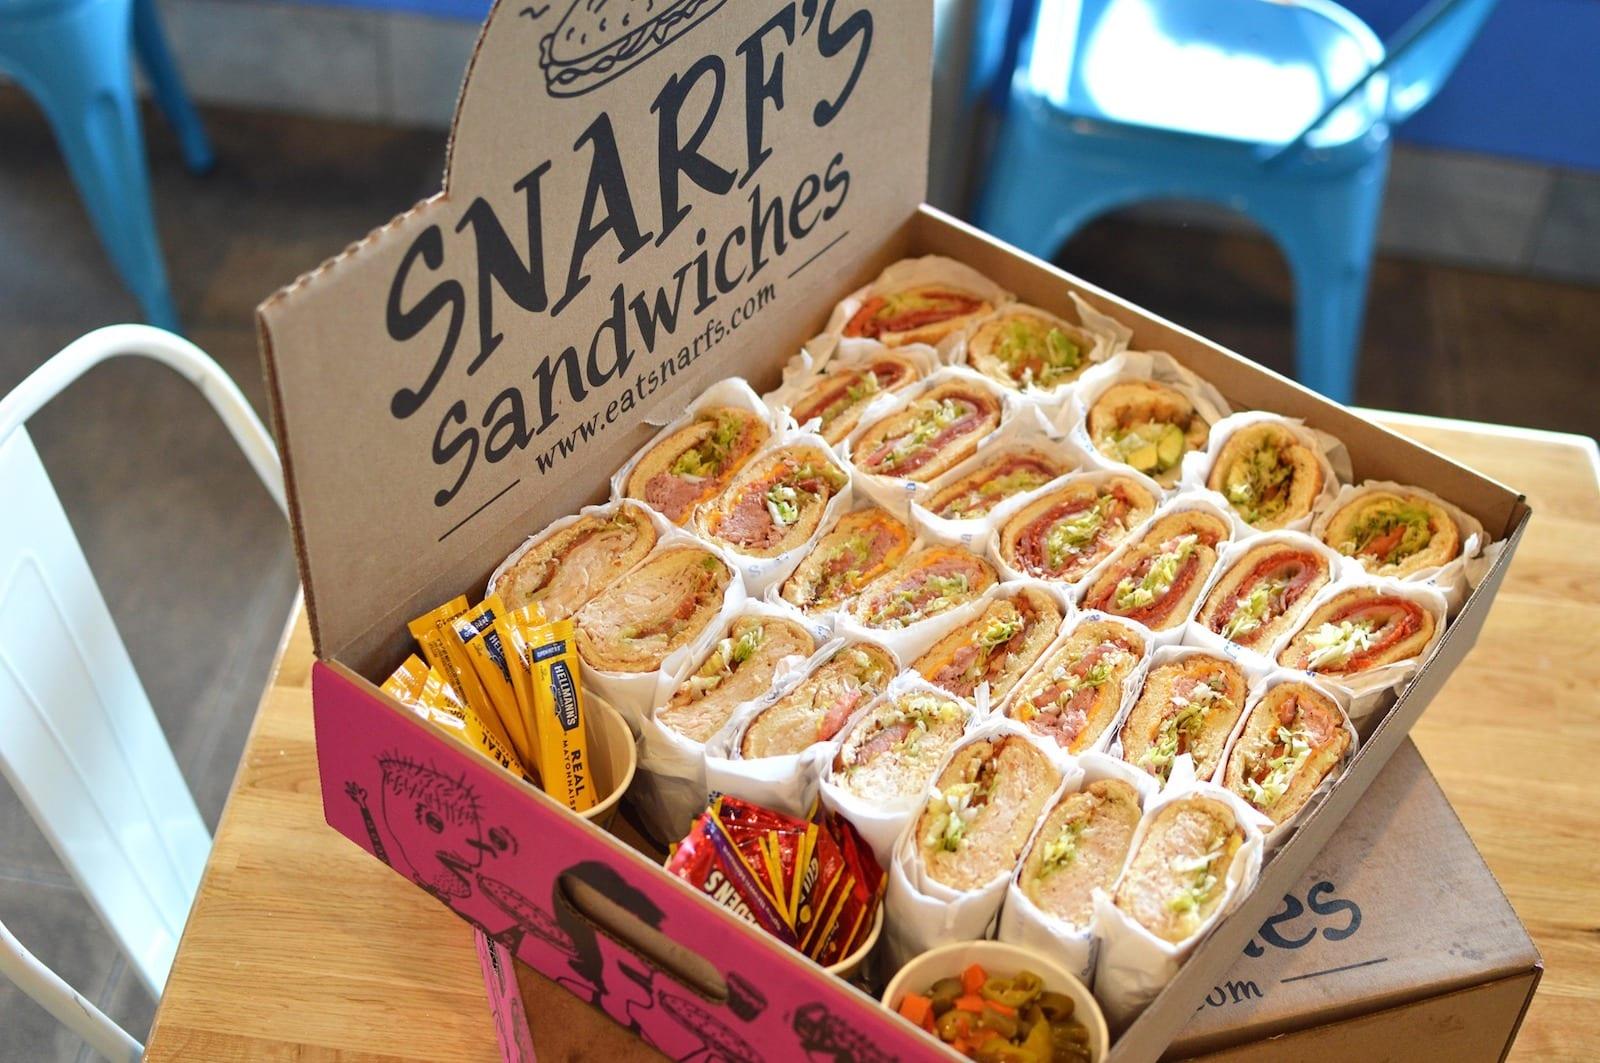 Snarfs Sandwiches Catering Colorado